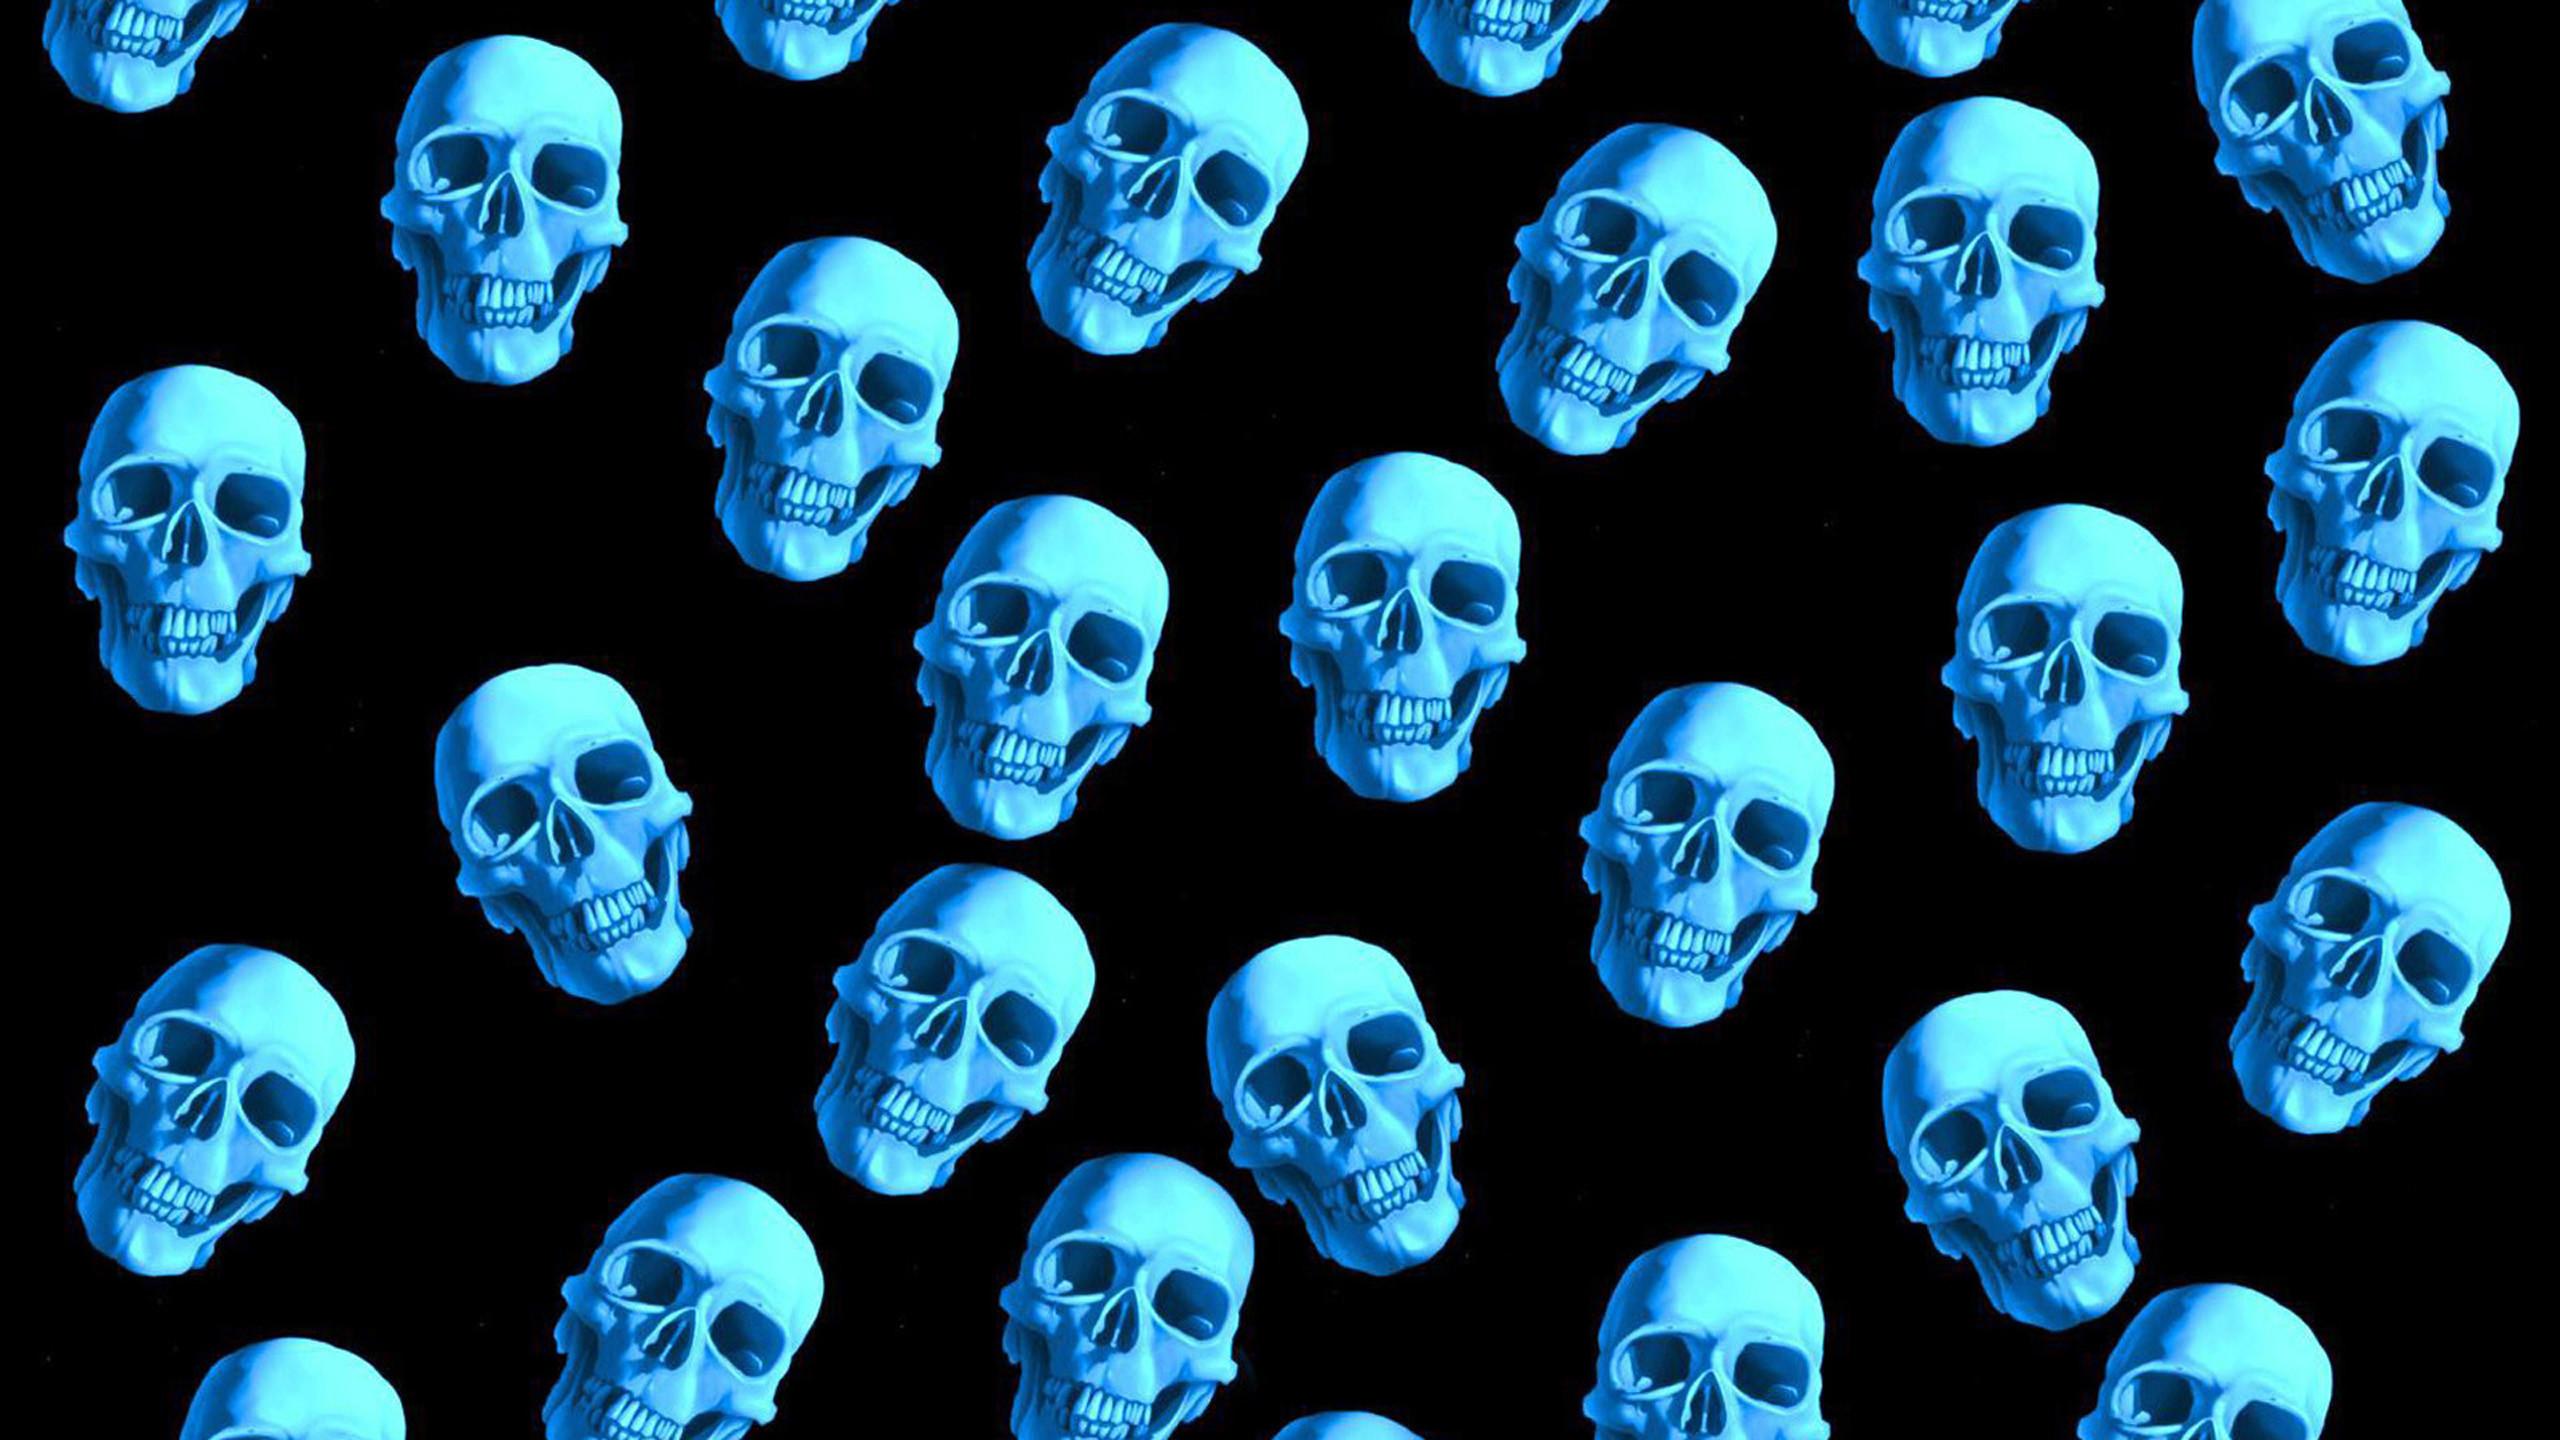 Skull Wallpaper HD (62+ pictures)